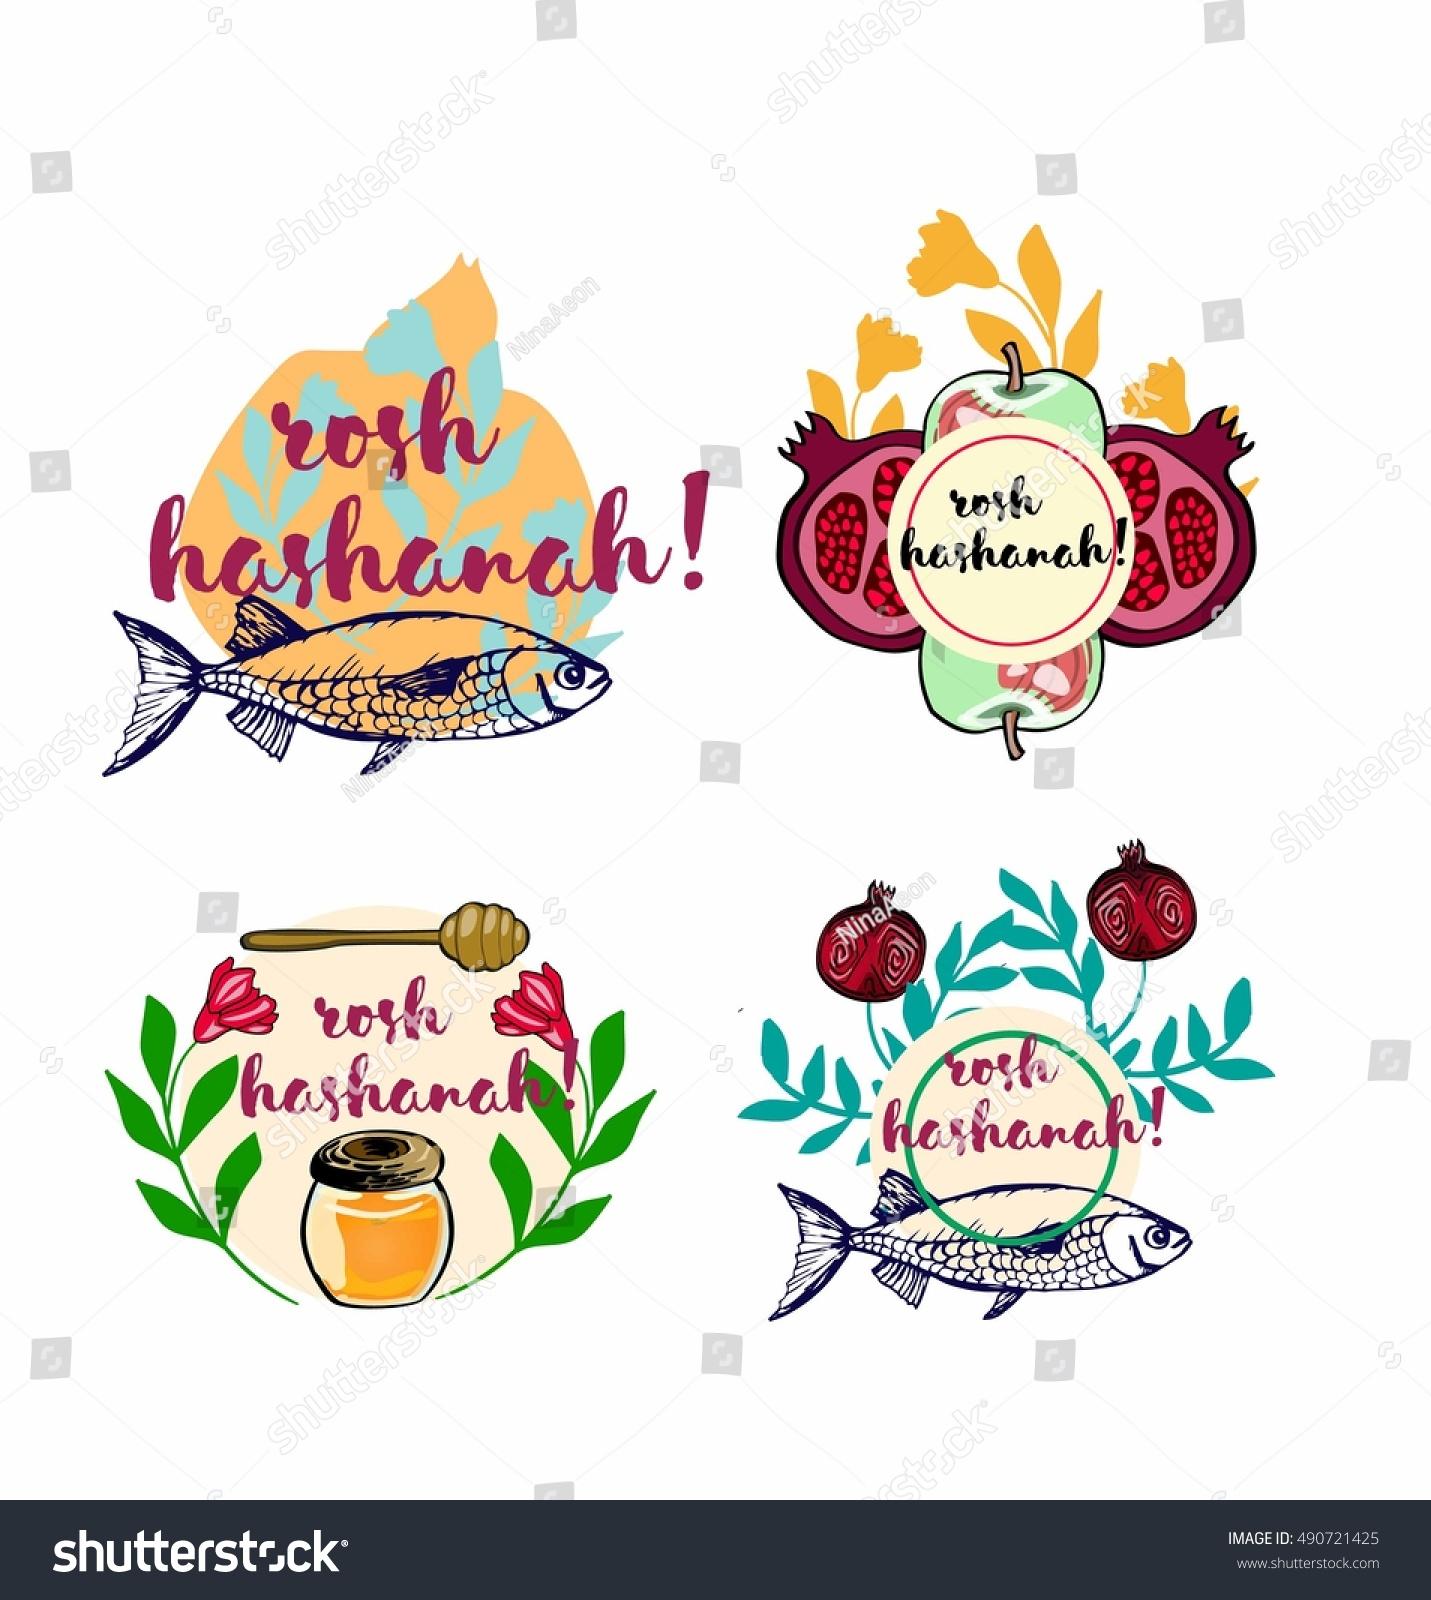 Pomegranatehoney Fish Greeting Card Vector Template Jewish Stock